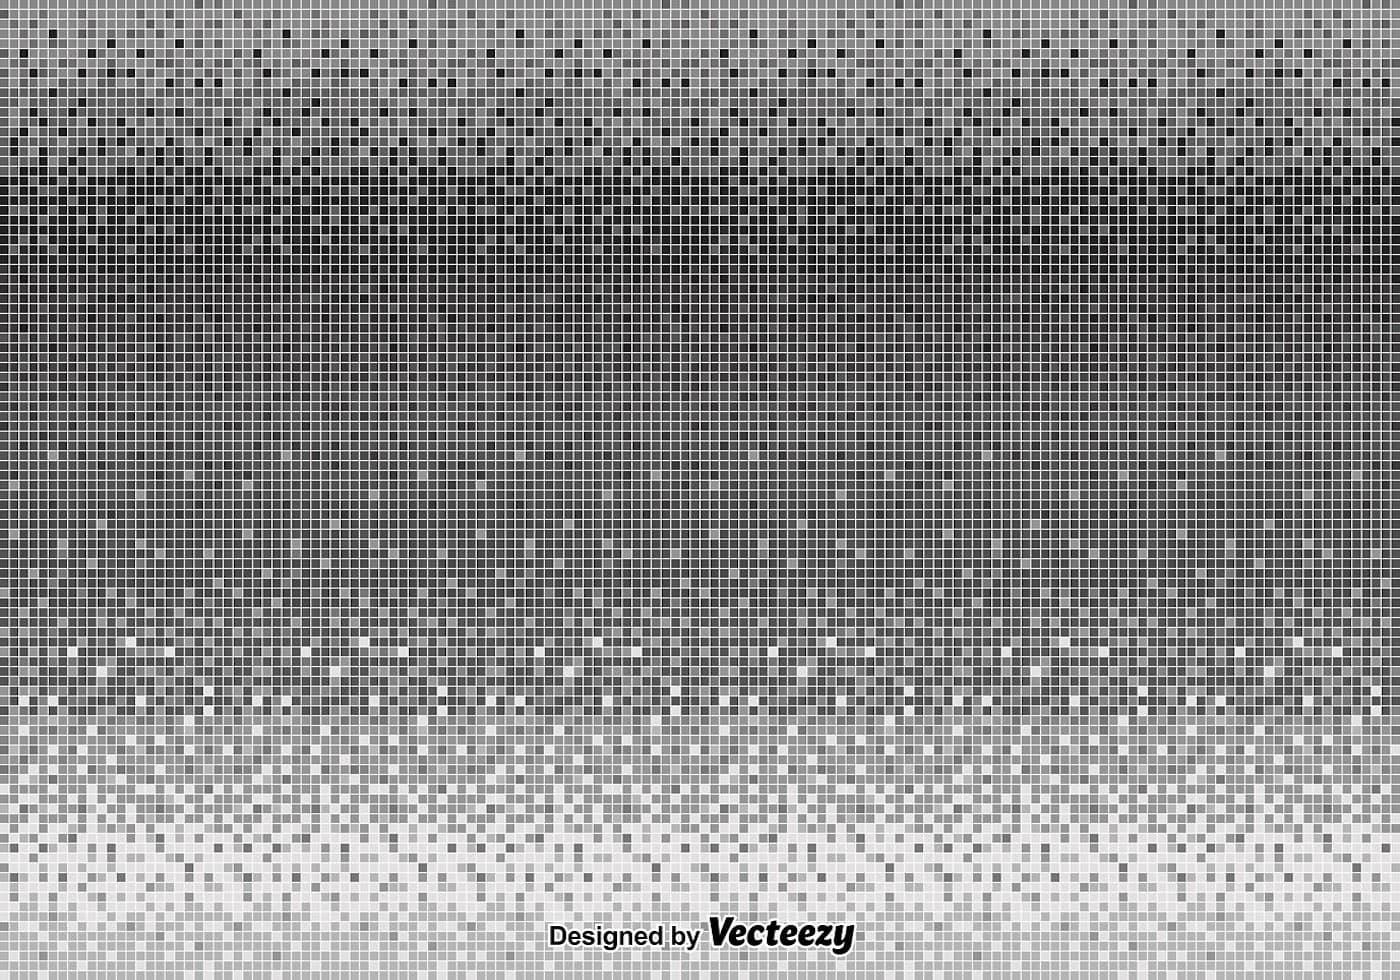 Modern 3d Wallpaper Texture Vector Gray Pixel Background Download Free Vector Art